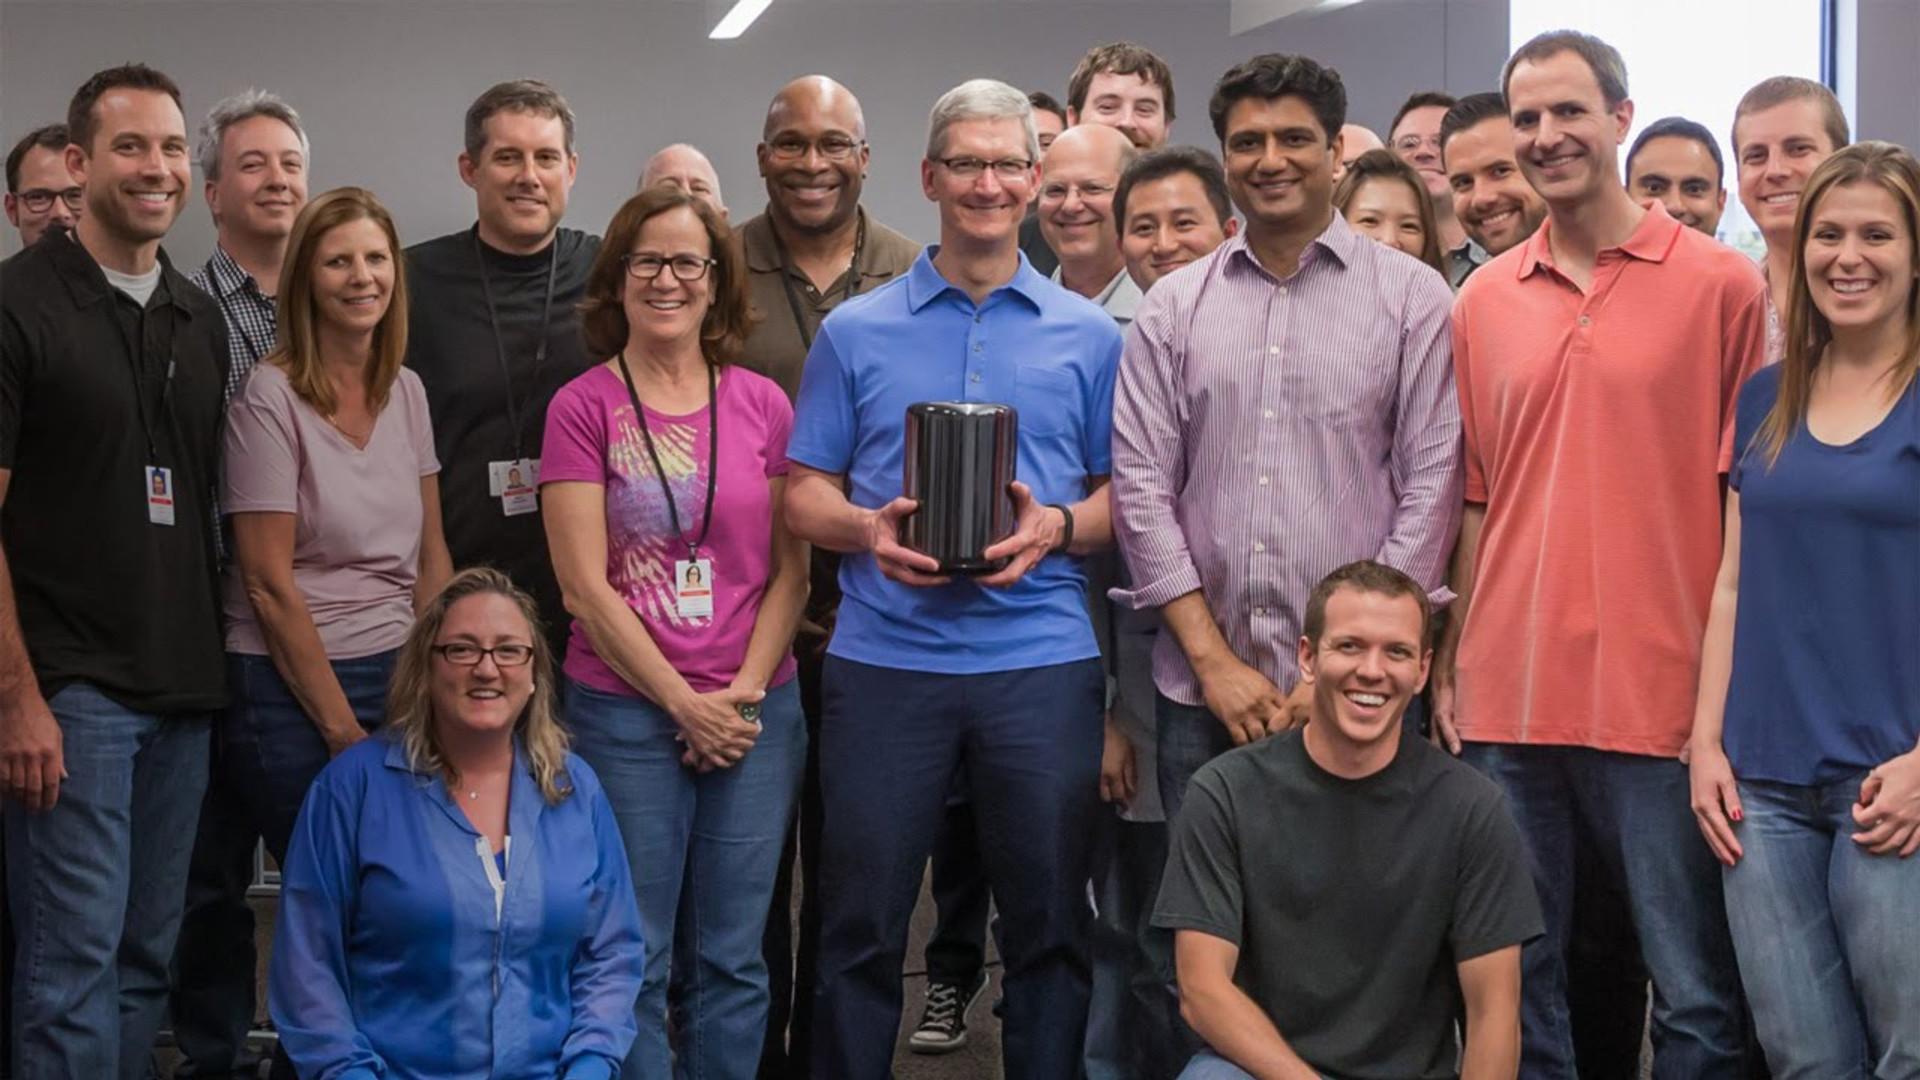 Apple: Diversity